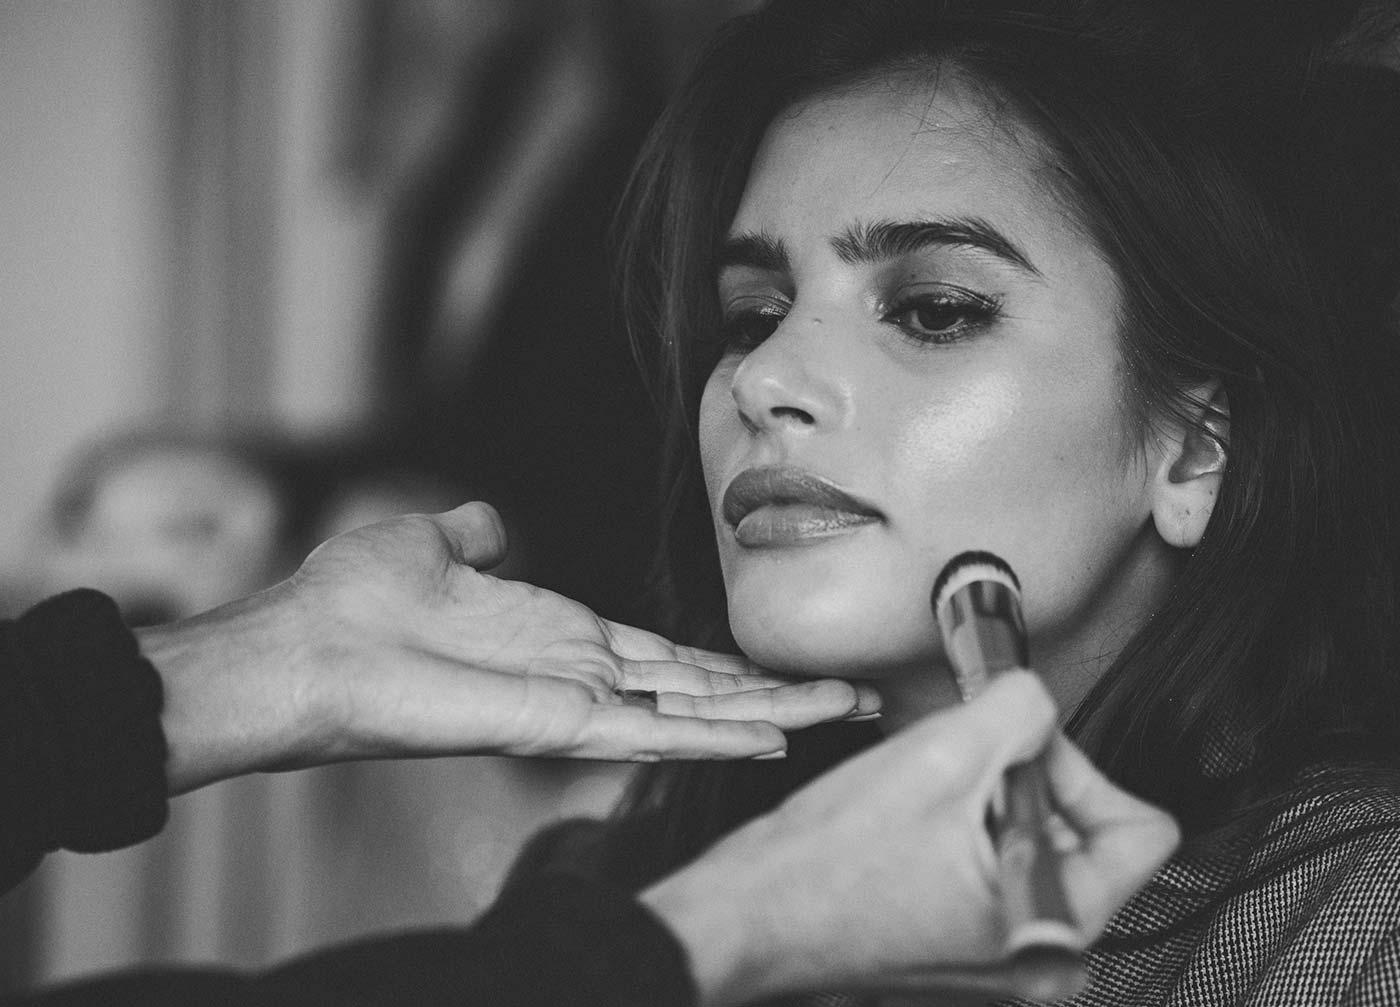 Cara applying Seint makeup on a model